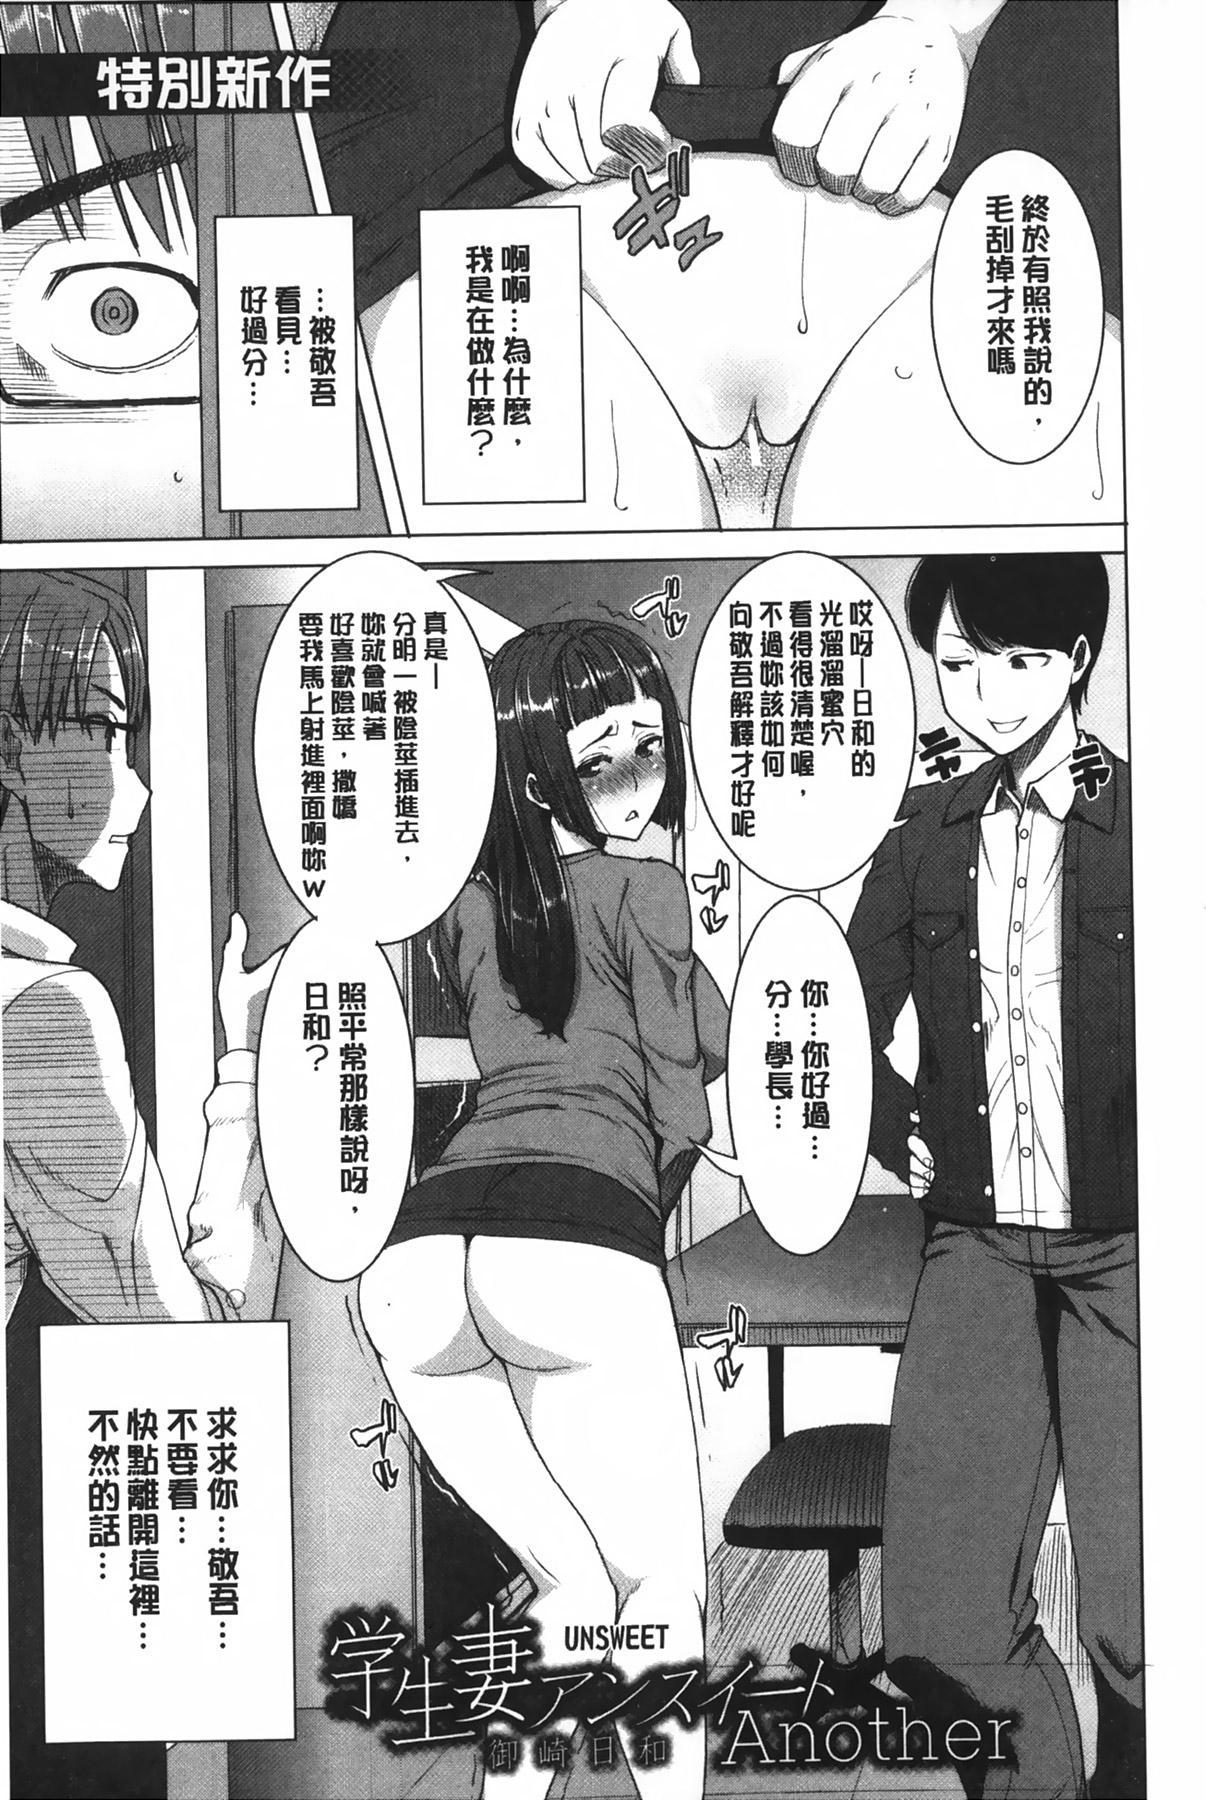 Ane Unsweet - Mihiragi Hiyori + | 姊姊不甜美 彌平木日和+ 199